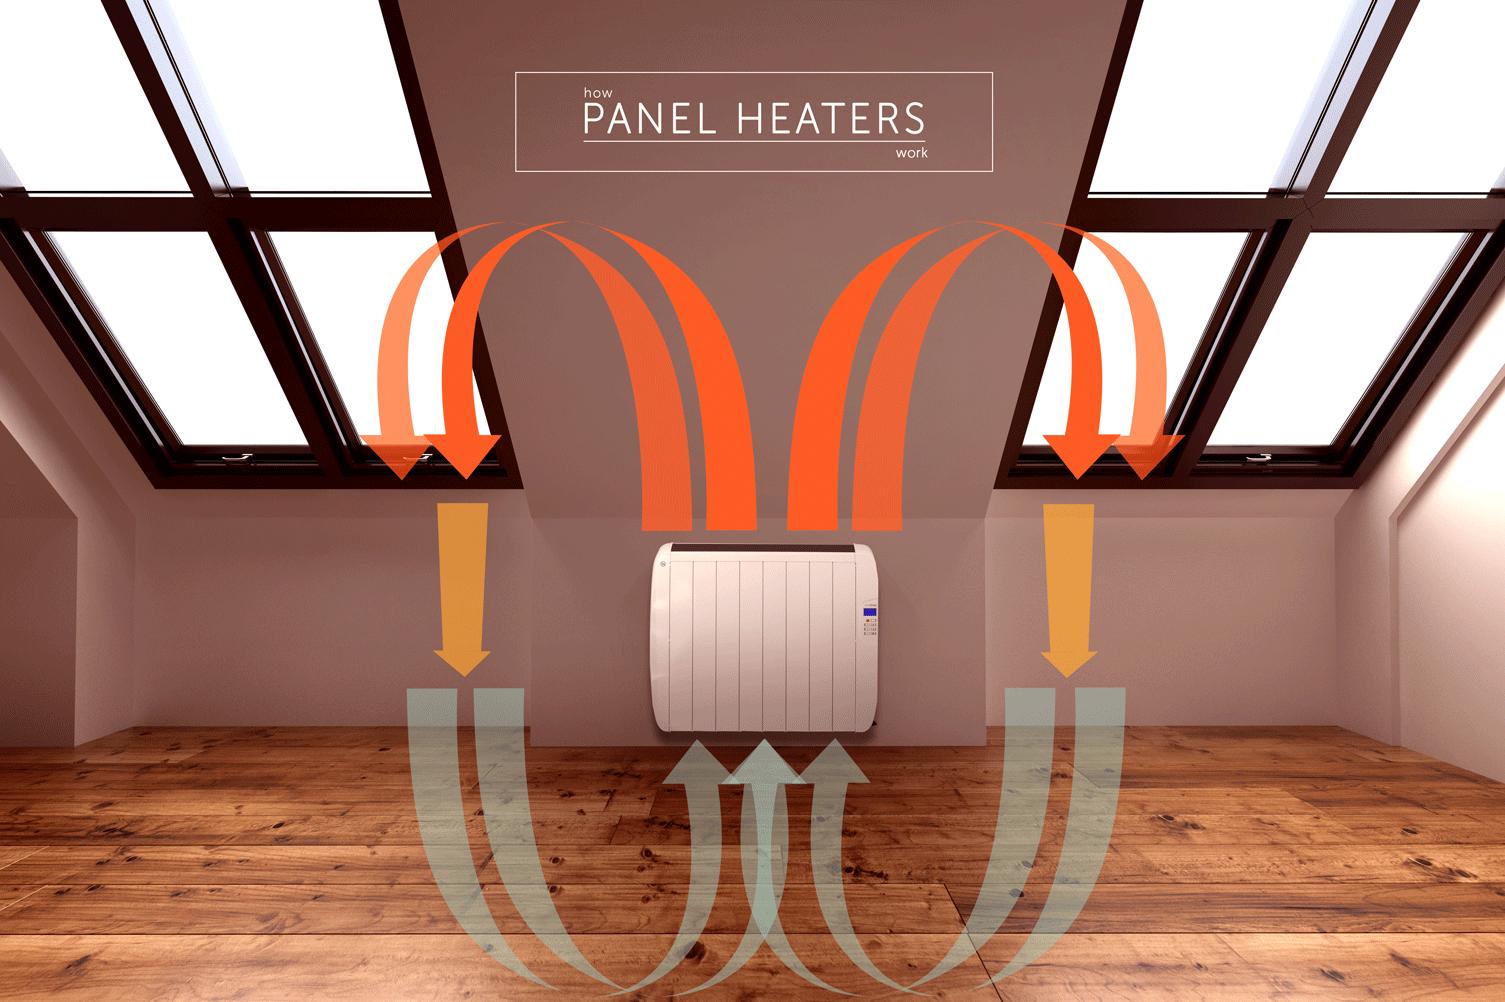 How panel heaters work